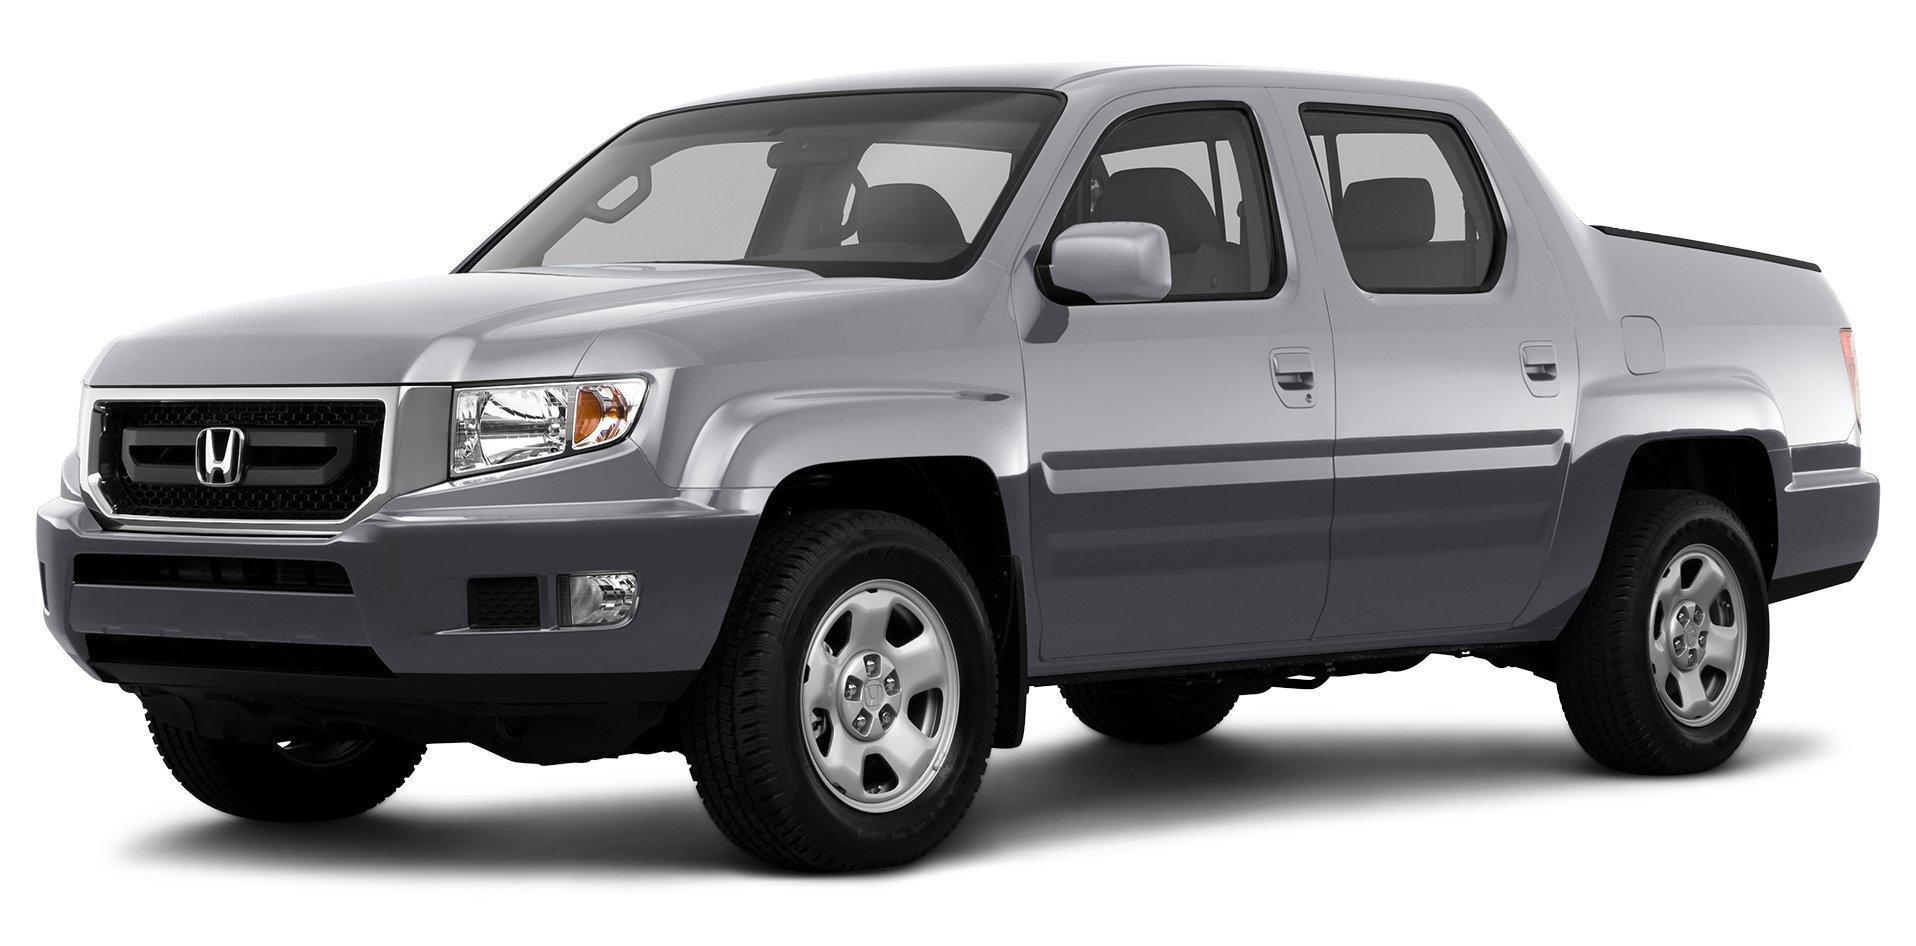 2010 Honda Ridgeline Reviews Images And Specs Vehicles Parts Diagram On Suspension Schematic Rt 4 Wheel Drive Crew Cab